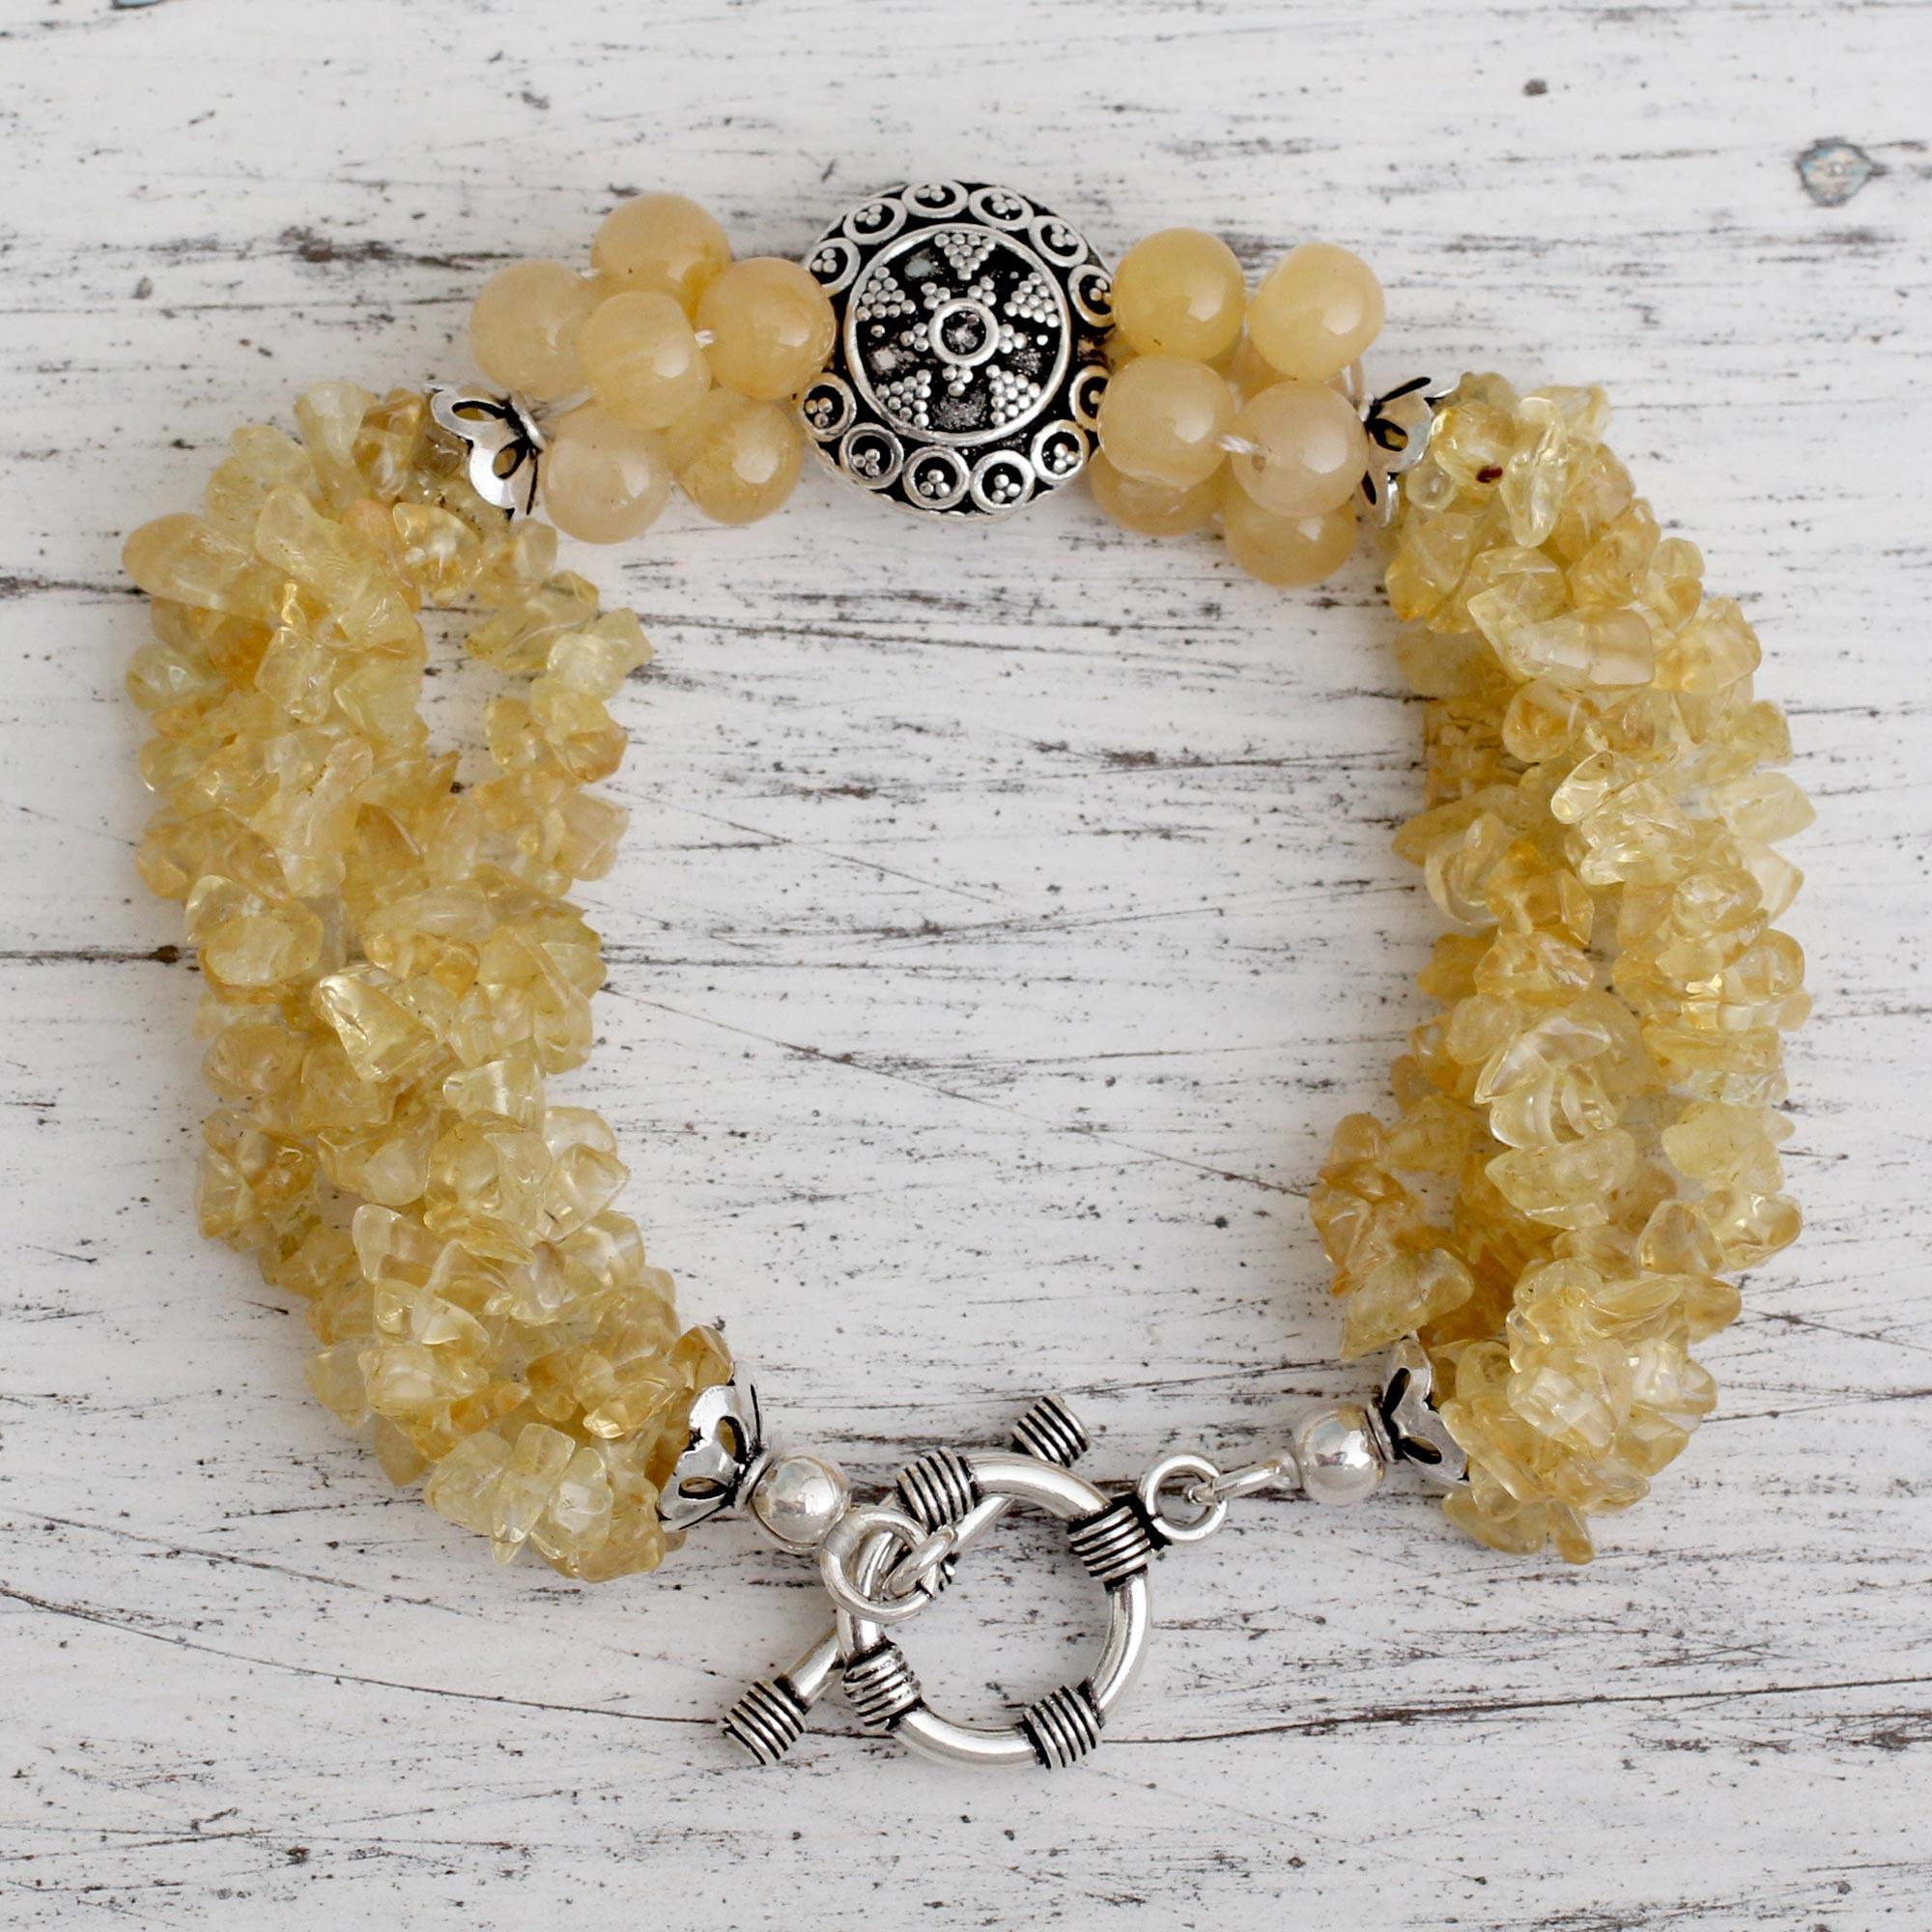 Unique Citrine Beaded Torsade Bracelet, 'Golden Treasure' Birthstone citrine